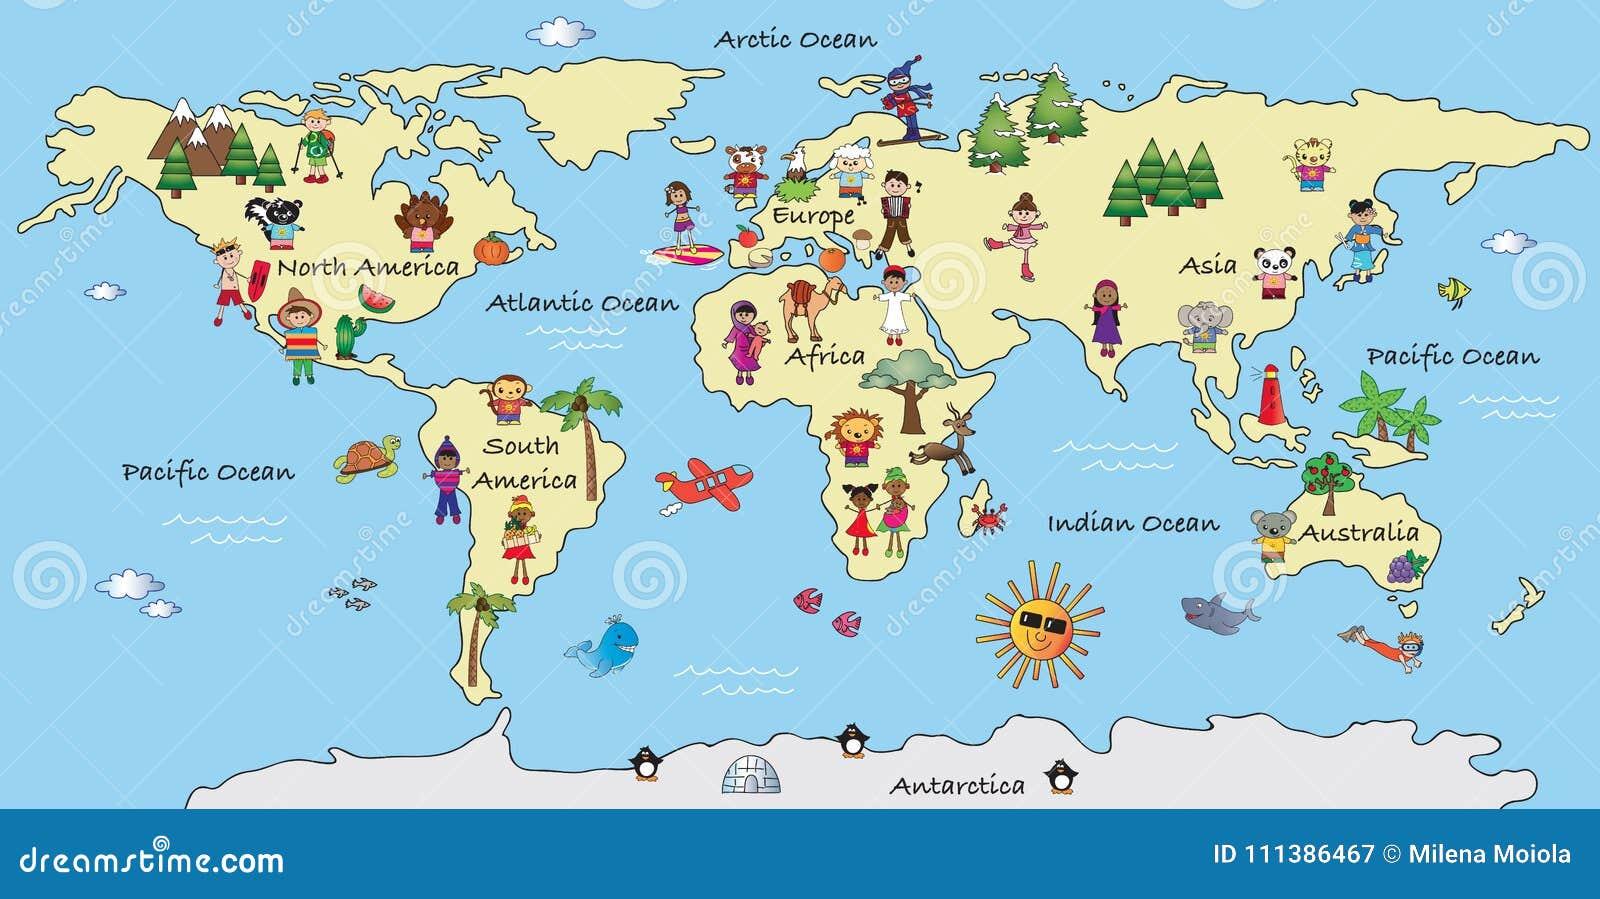 World map illustration stock illustration. Illustration of cartoon ...